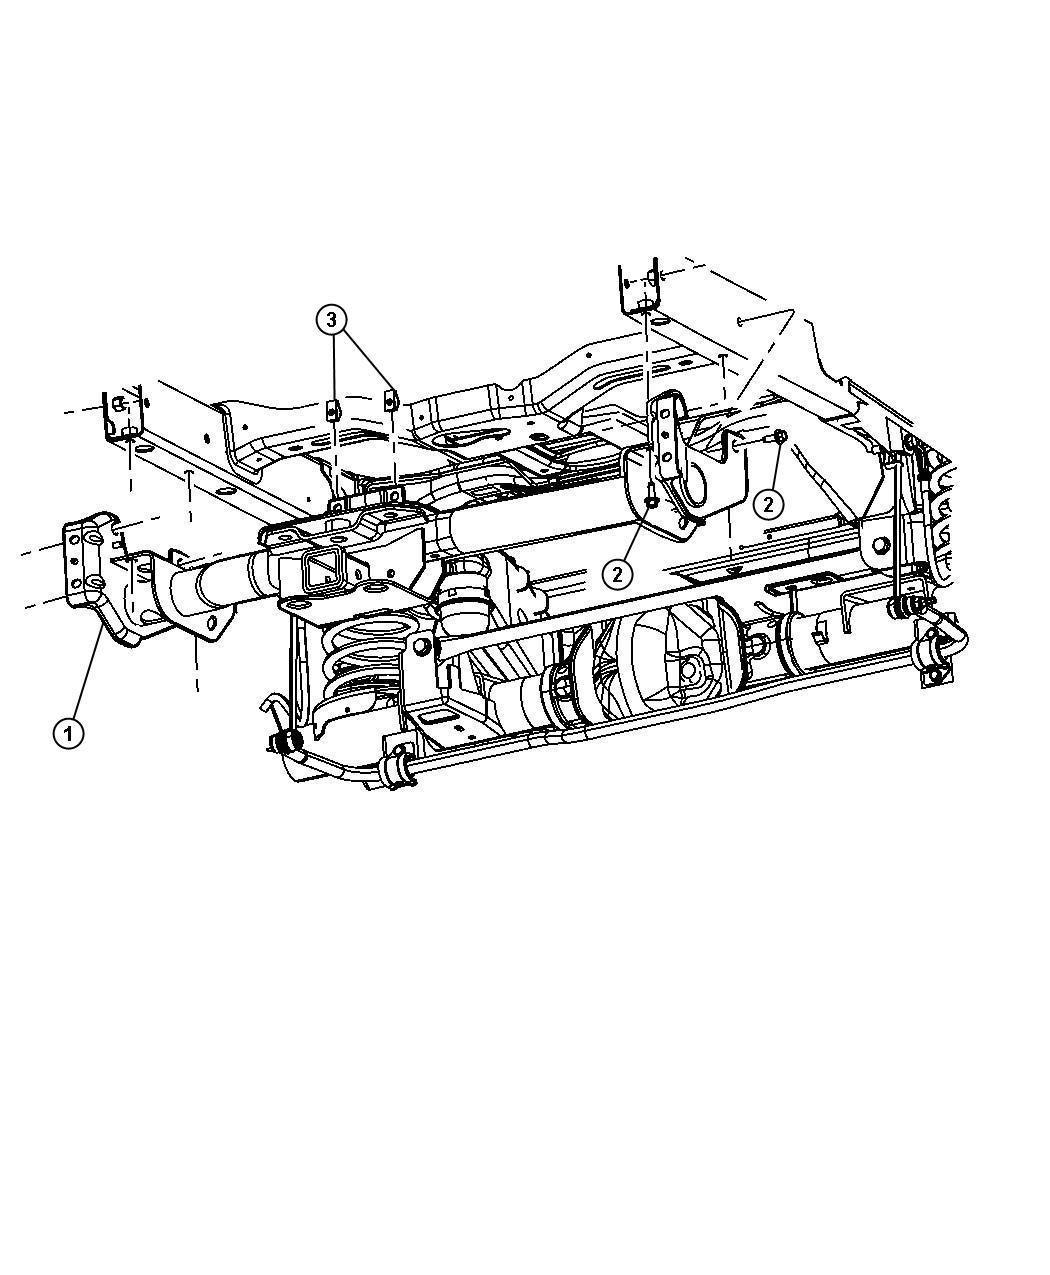 Dodge Ram Receiver Kit Trailer Tow Class Iv